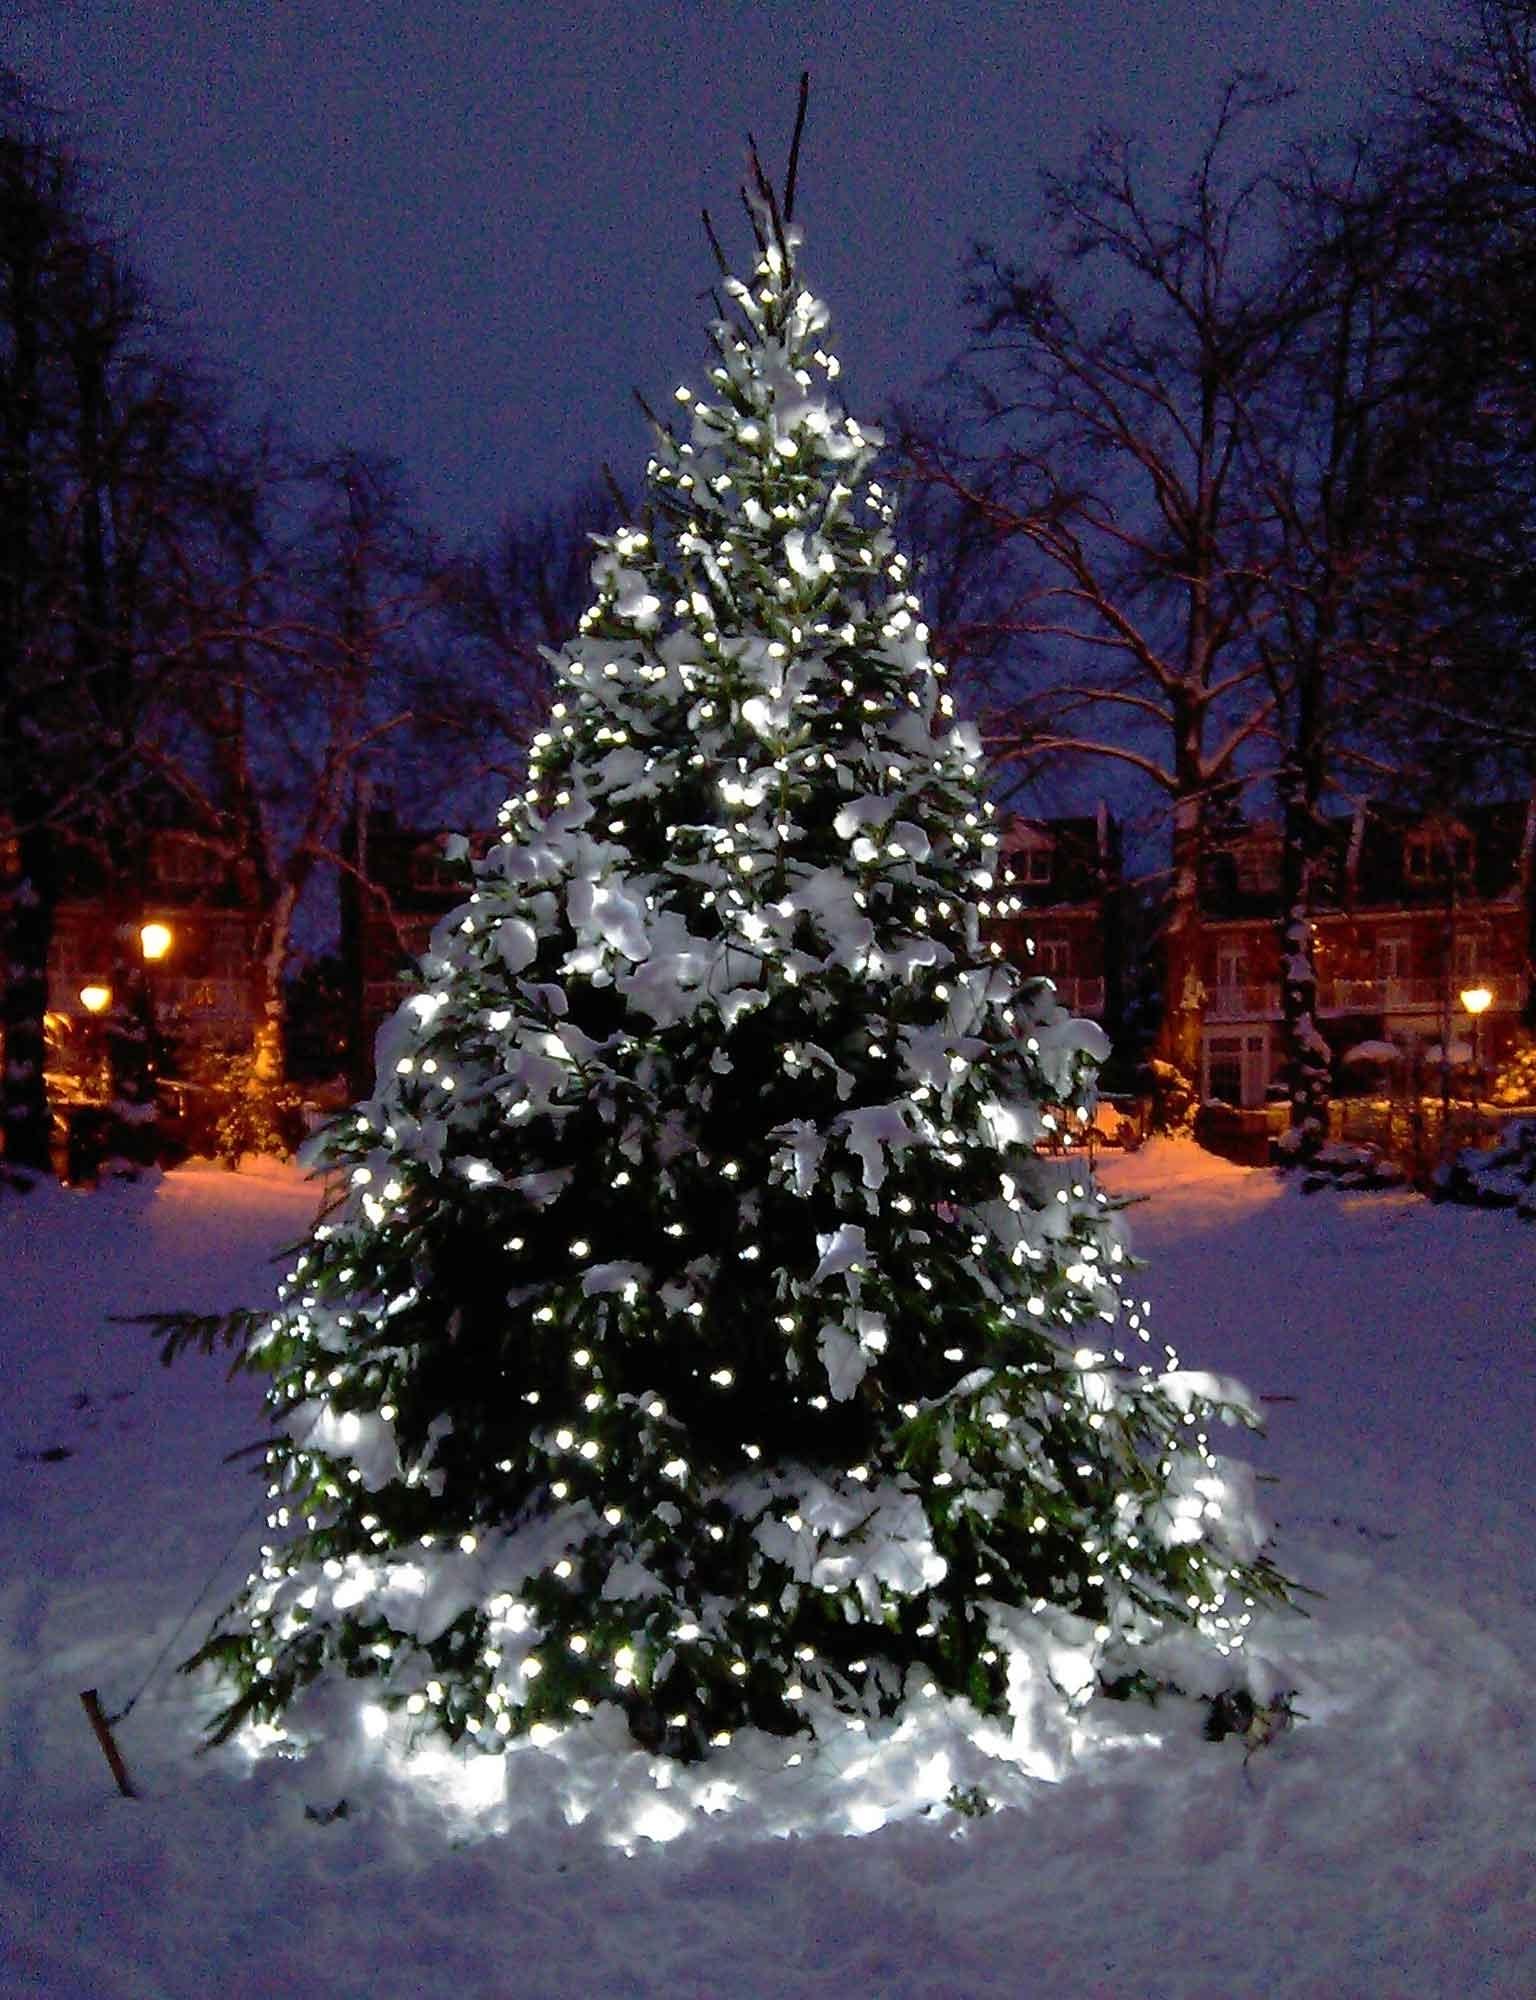 Christmas Tree Light Ideas | Christmas Light Ideas | Inspiration with regard to Outdoor Xmas Lanterns (Image 8 of 20)